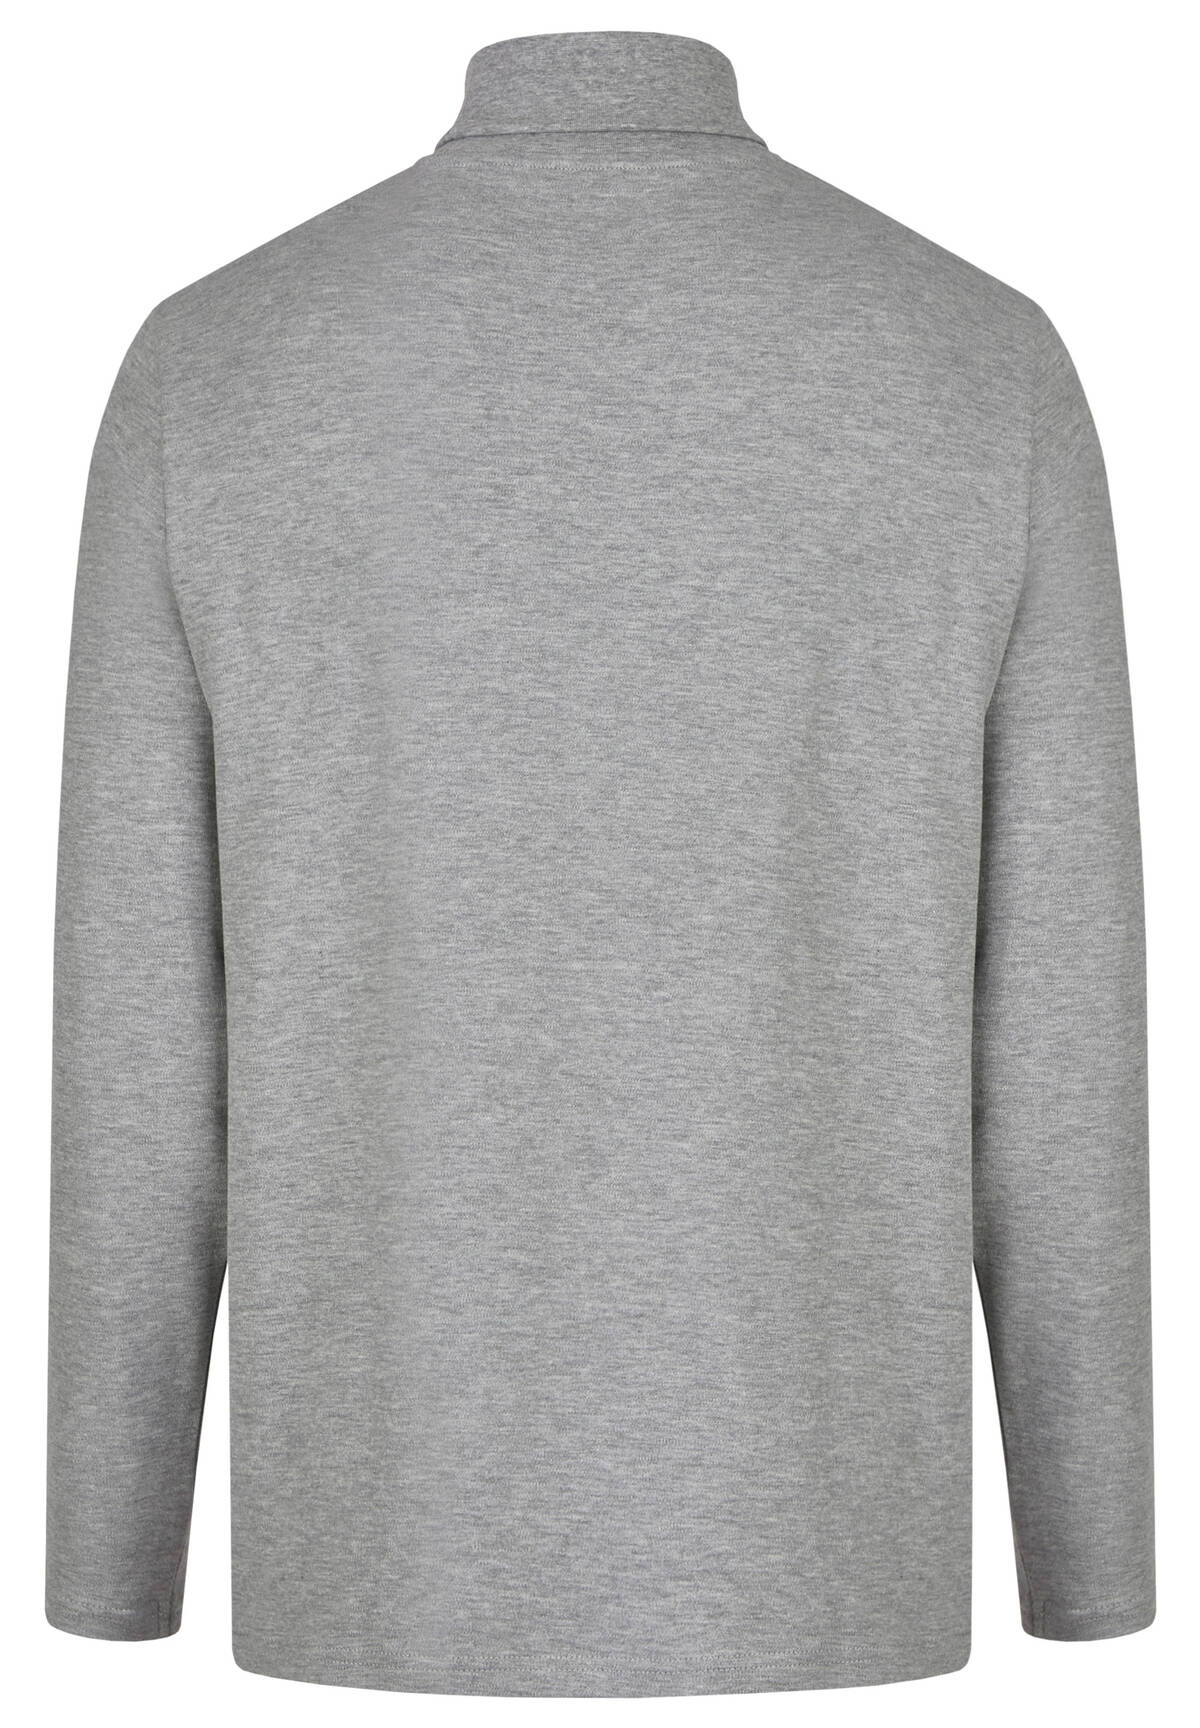 Rollneck-Shirt / T-SHIRT ROLLNECK